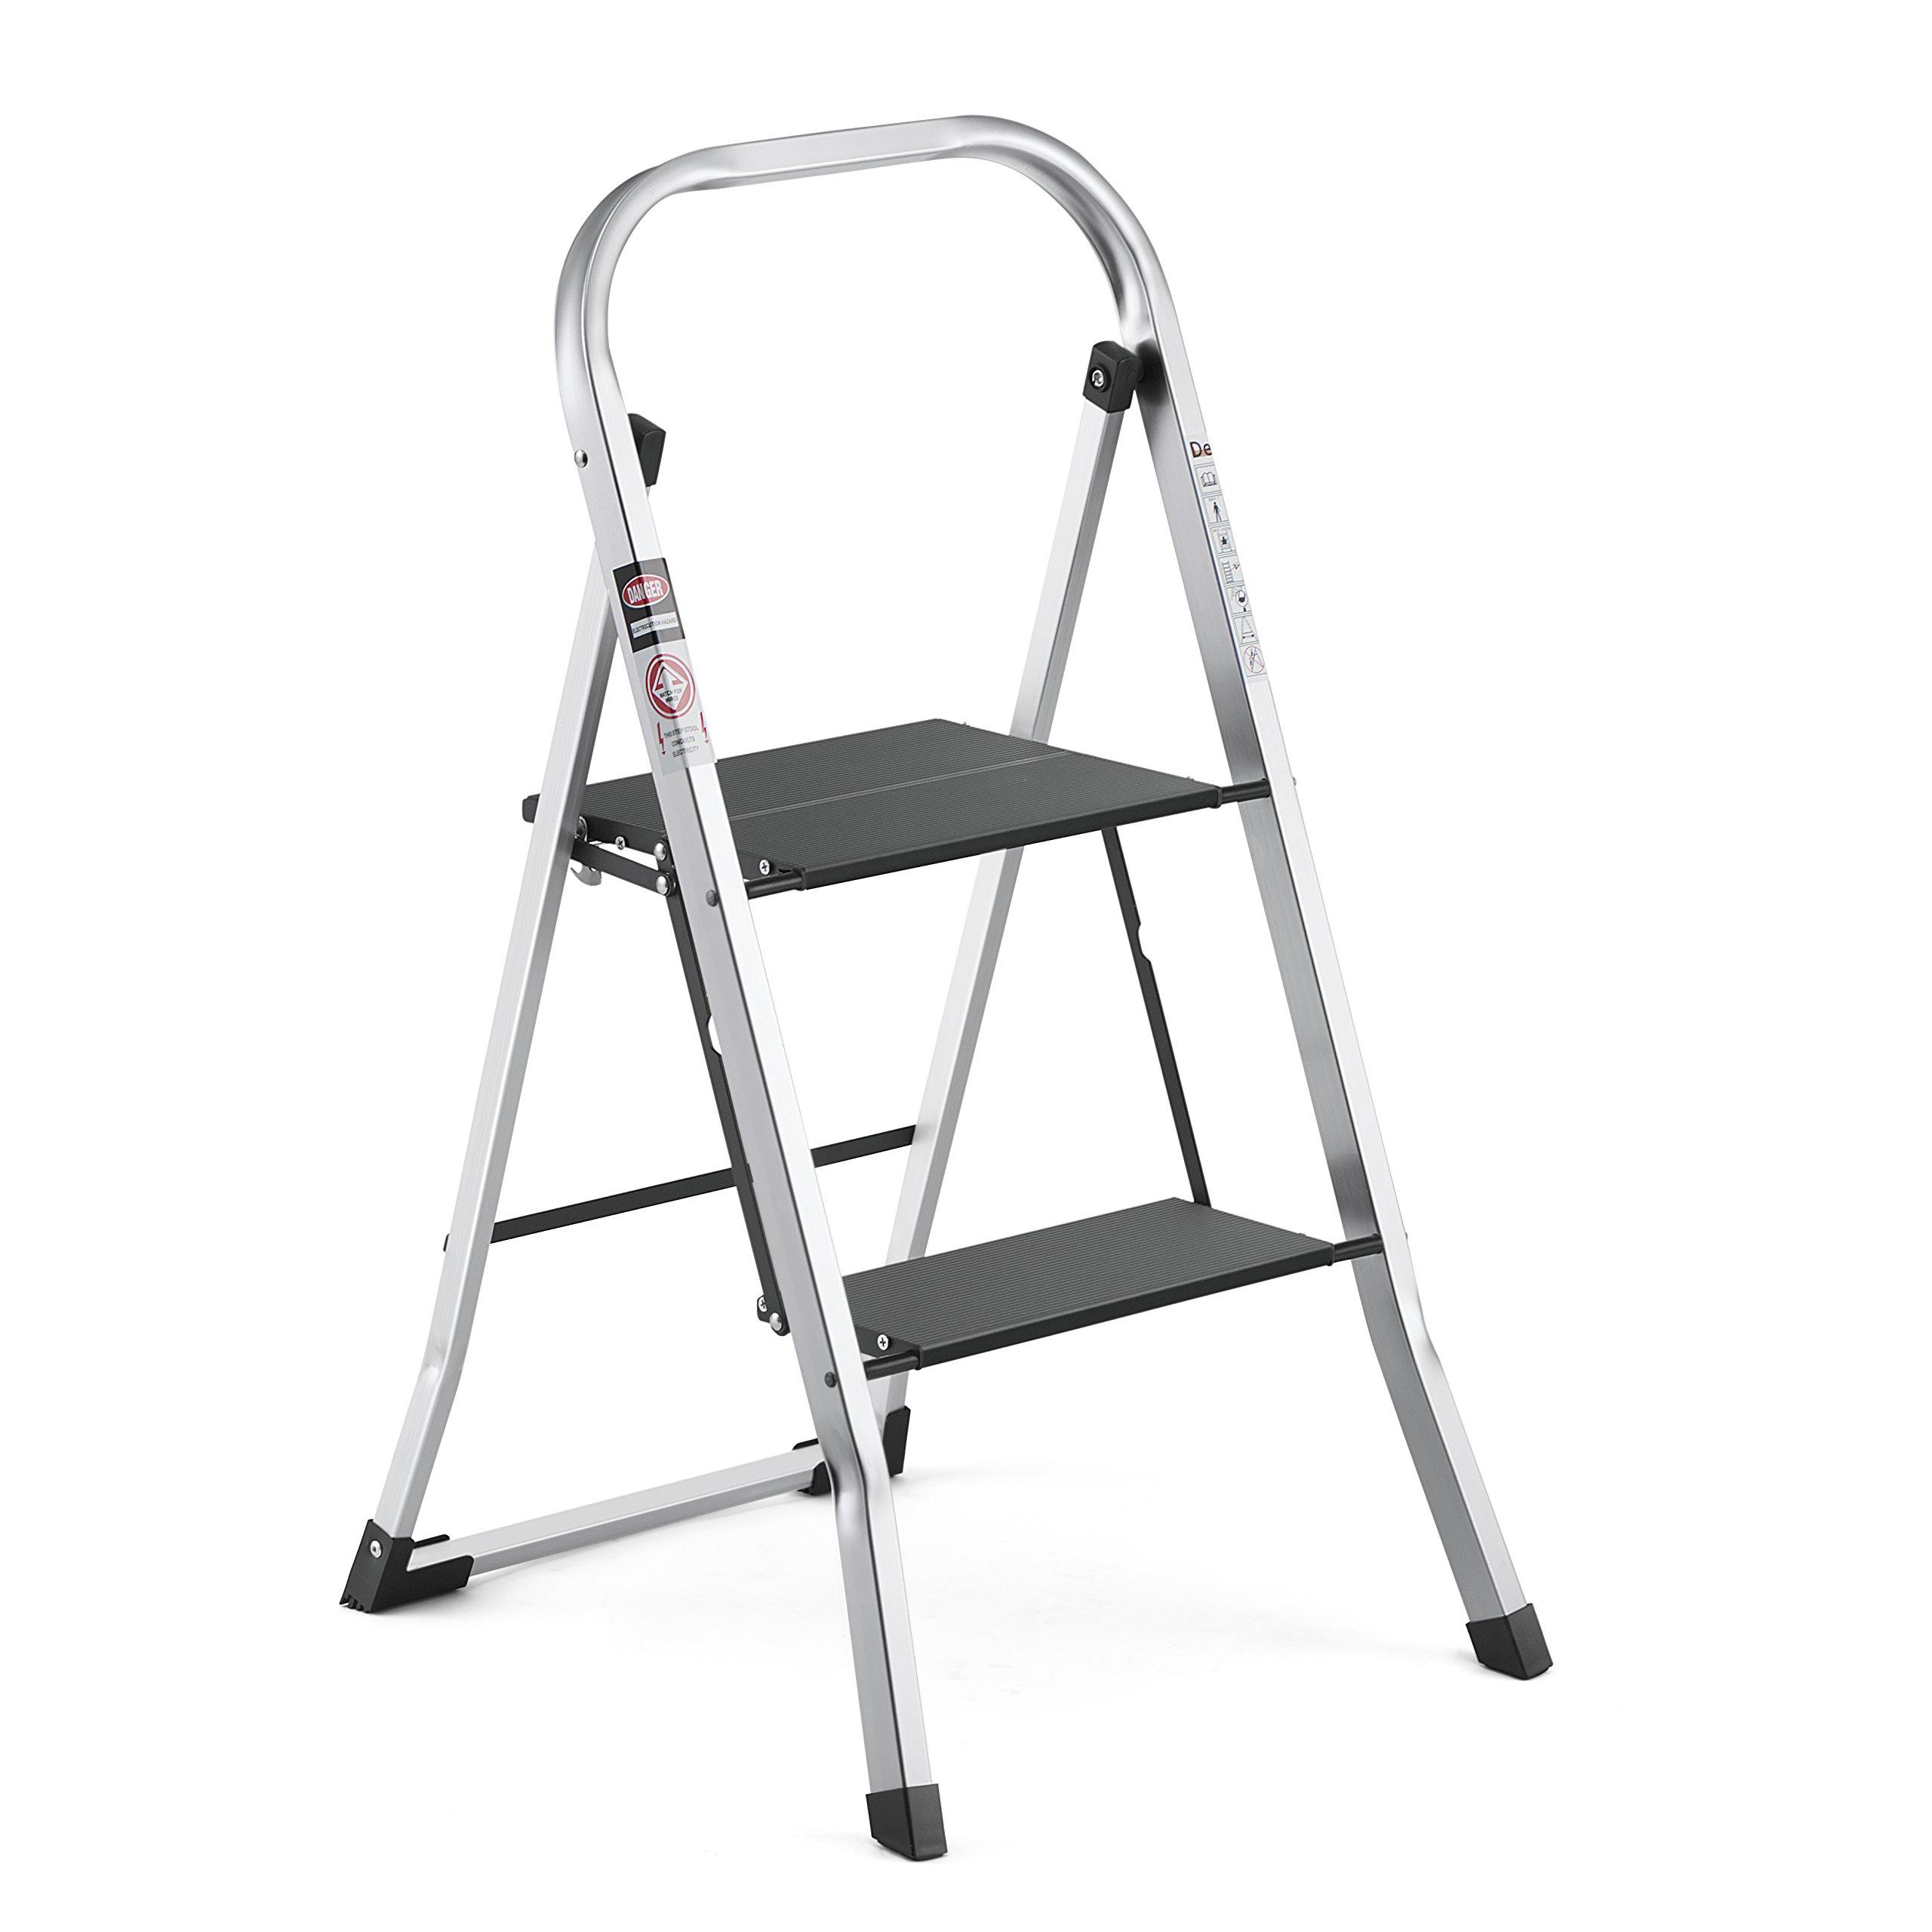 Details About Delxo Upgrade Lightweight Aluminum 2 Step Ladder Step Stool  Single Hand Carry